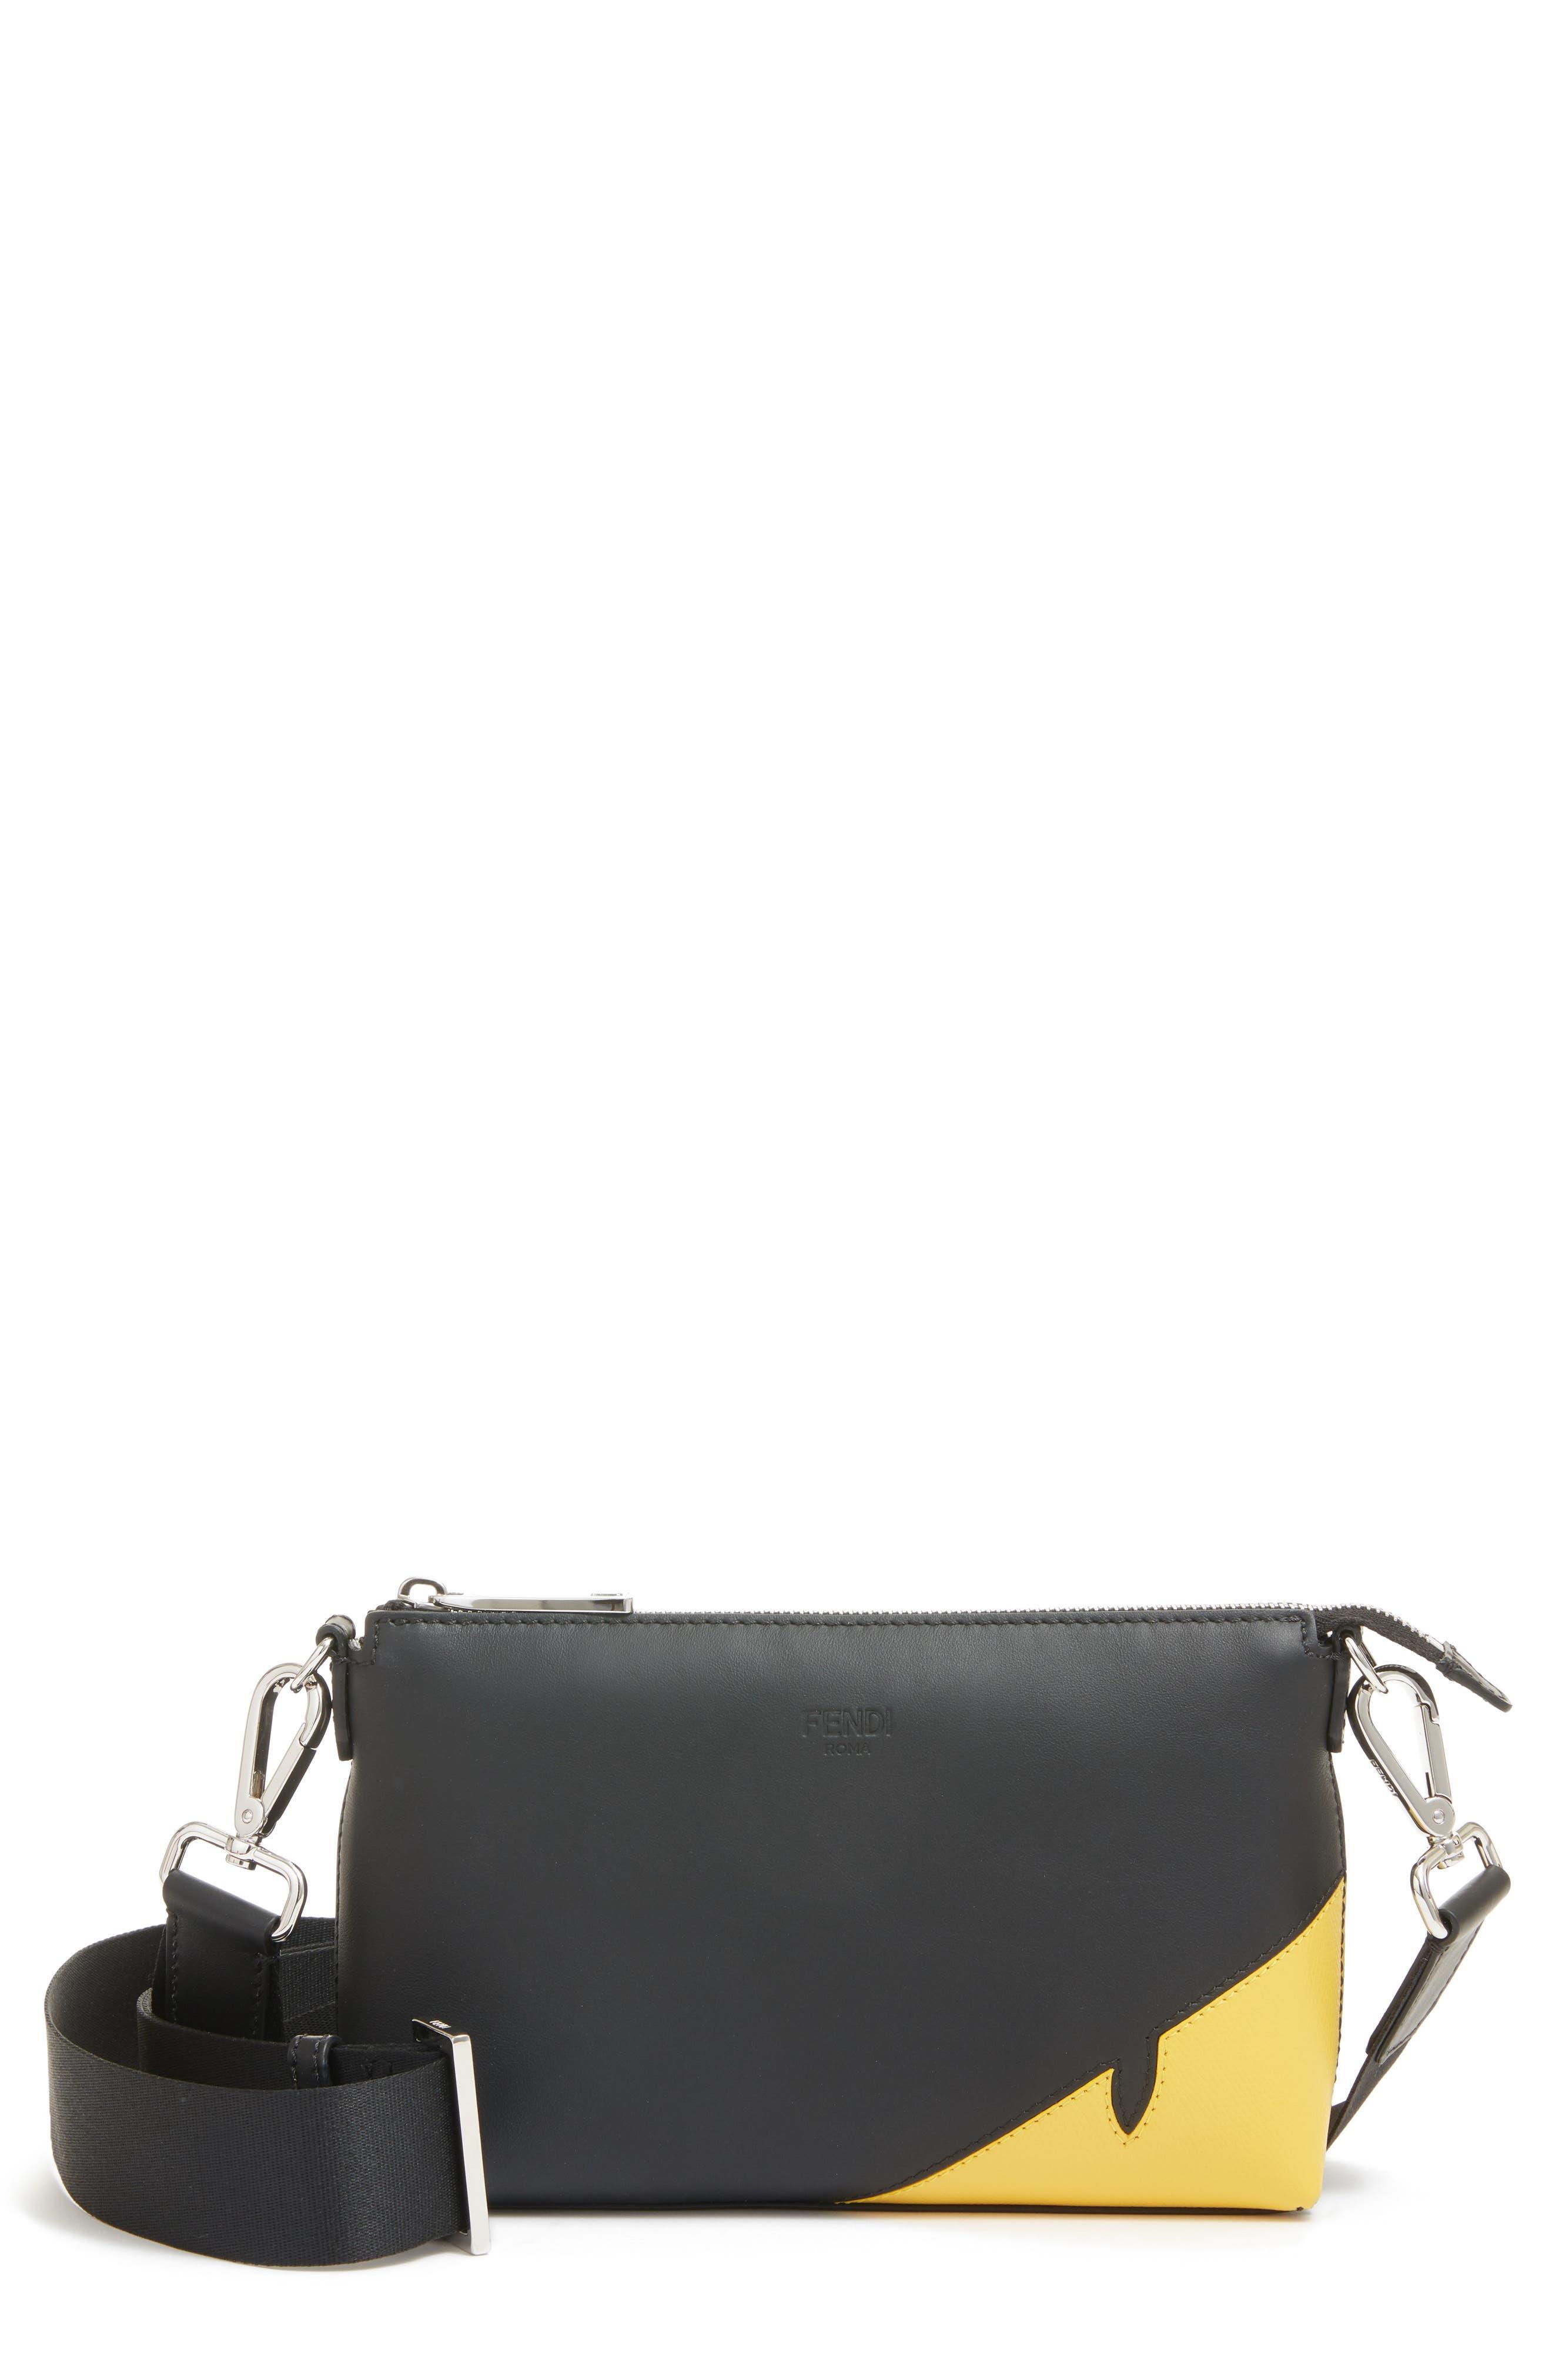 Fuck-It Travel Messenger Bags Handbag Shoulder Bag Crossbody Bag Unisex